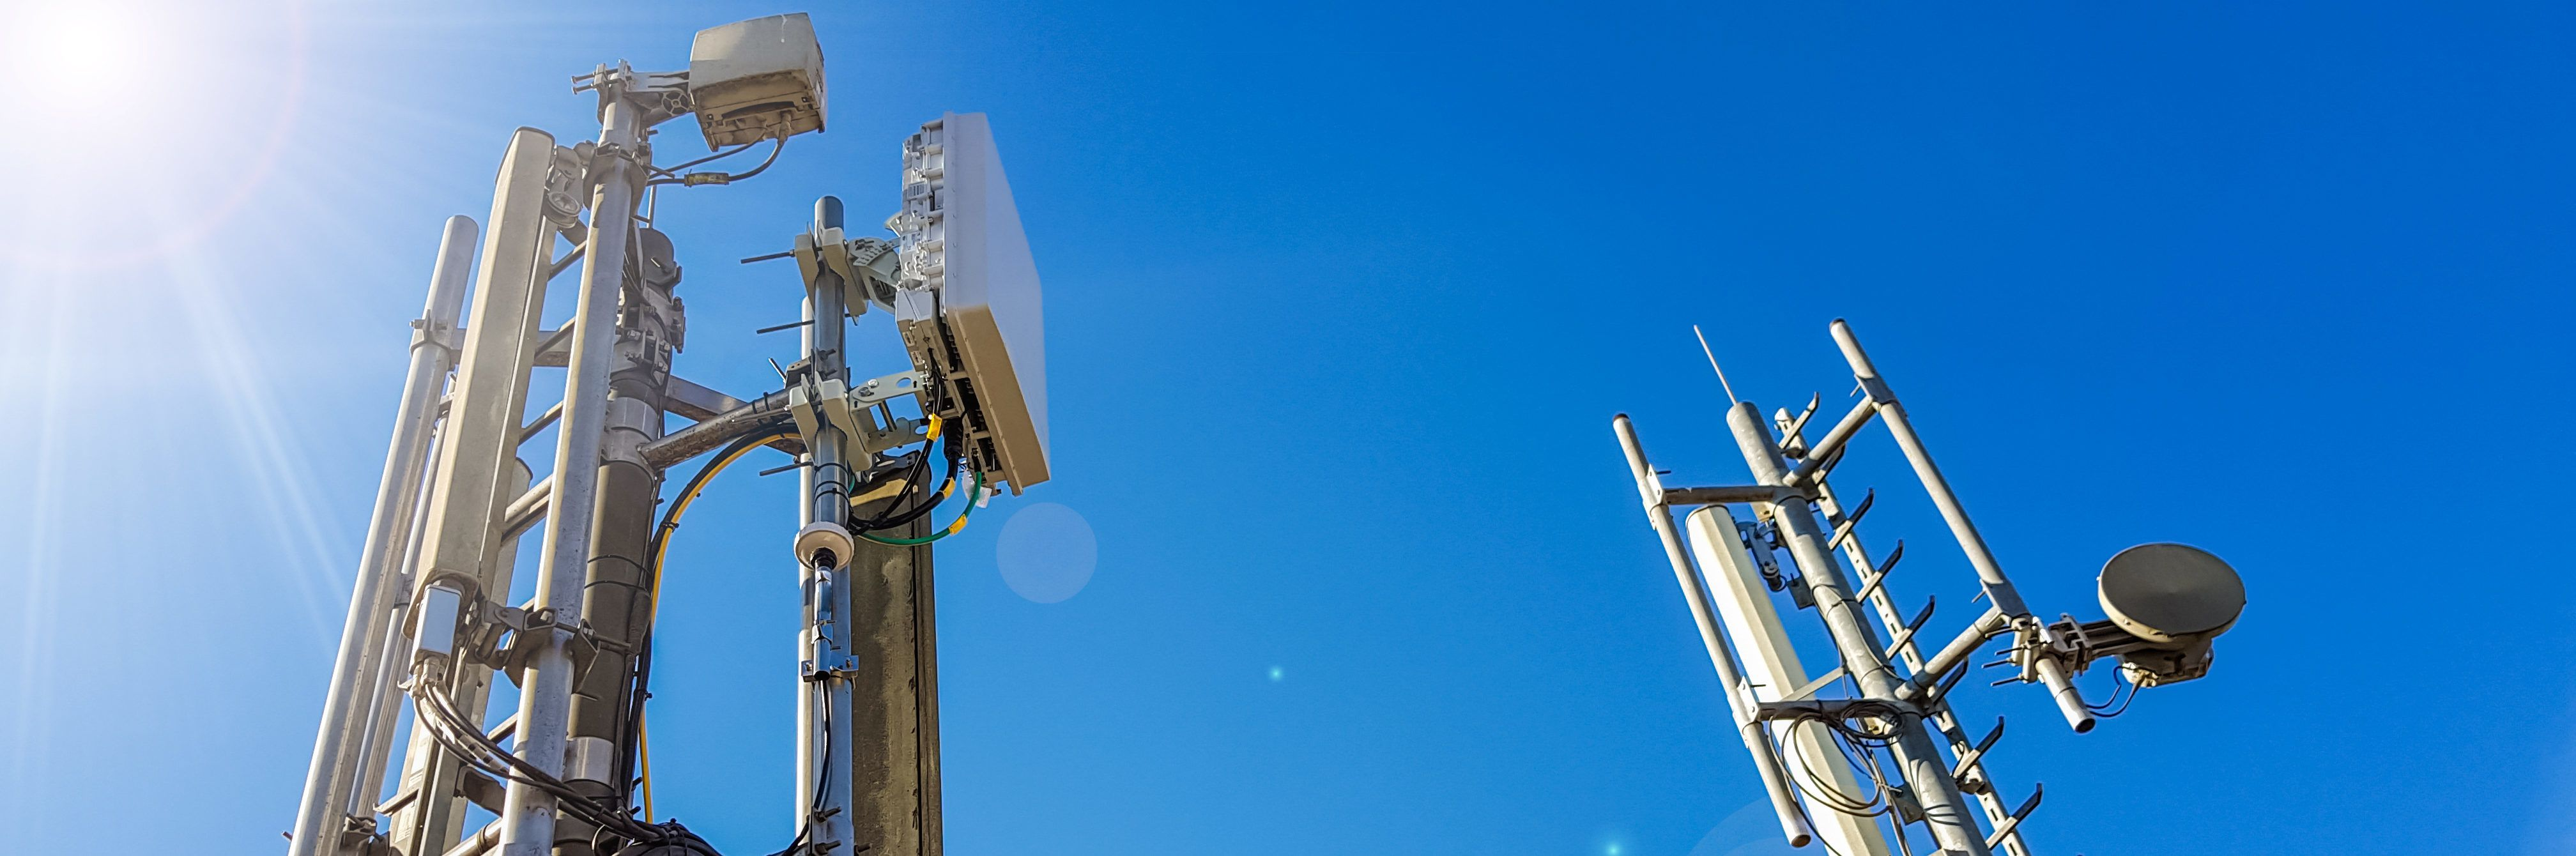 Telco blog - 5G Networks